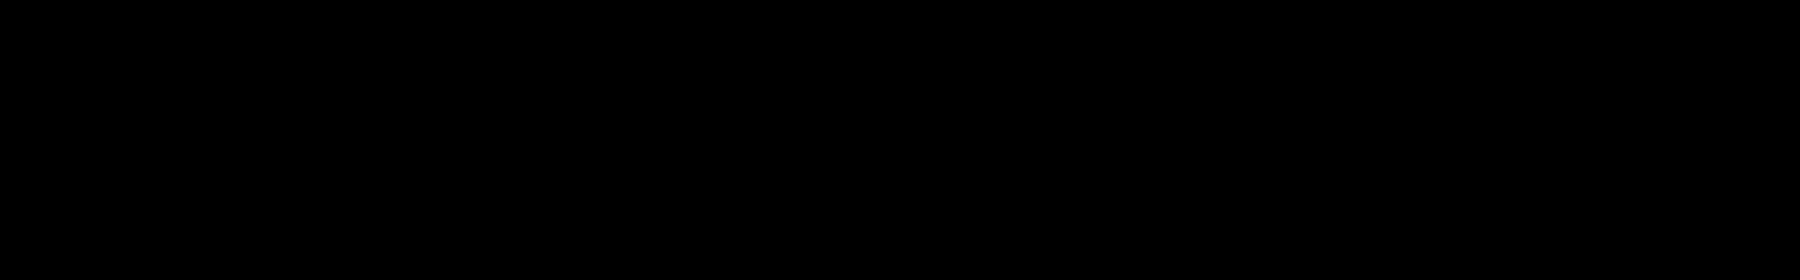 VVS audio waveform